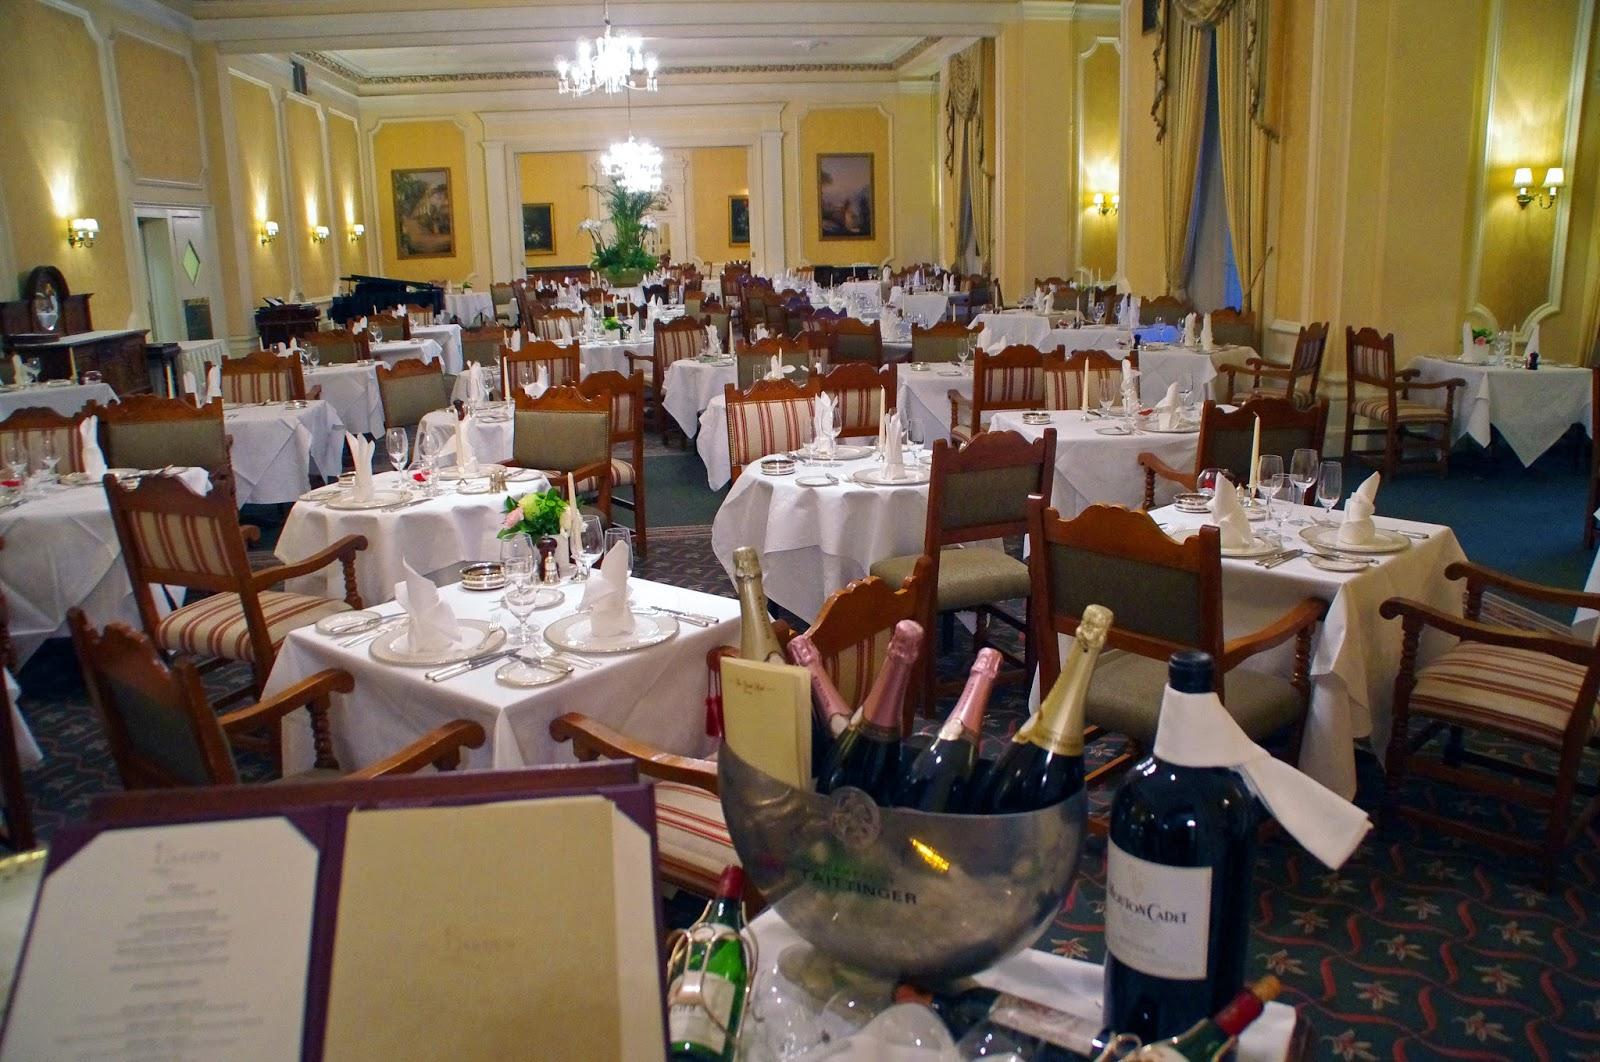 The Grand Hotel Eastbourne Garden Restaurant